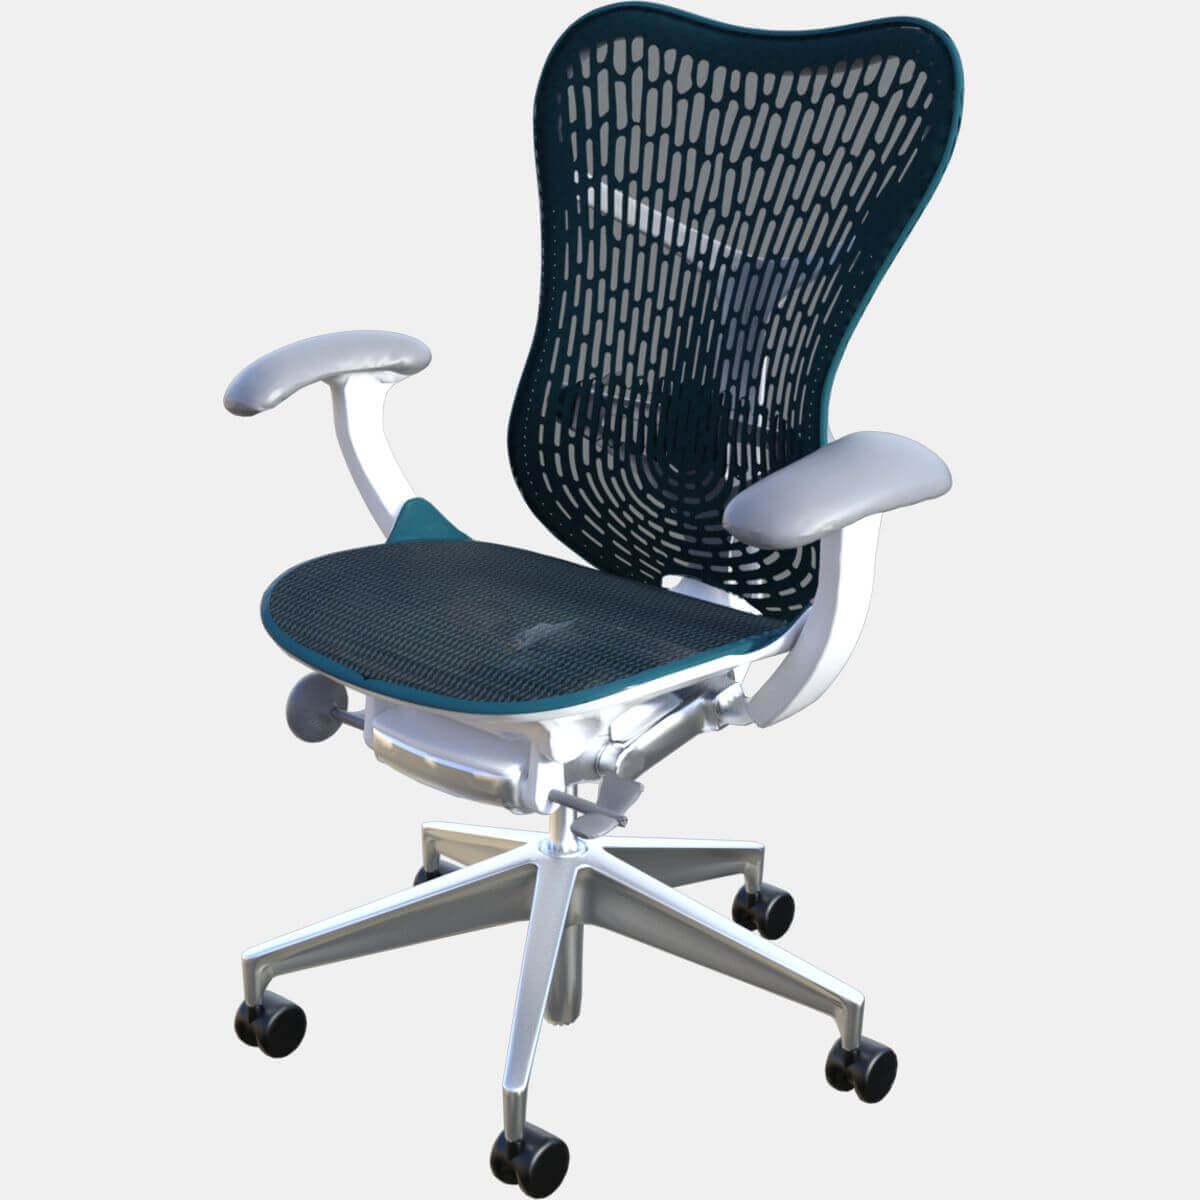 herman miller mirra 2 chair free 3d model. Black Bedroom Furniture Sets. Home Design Ideas